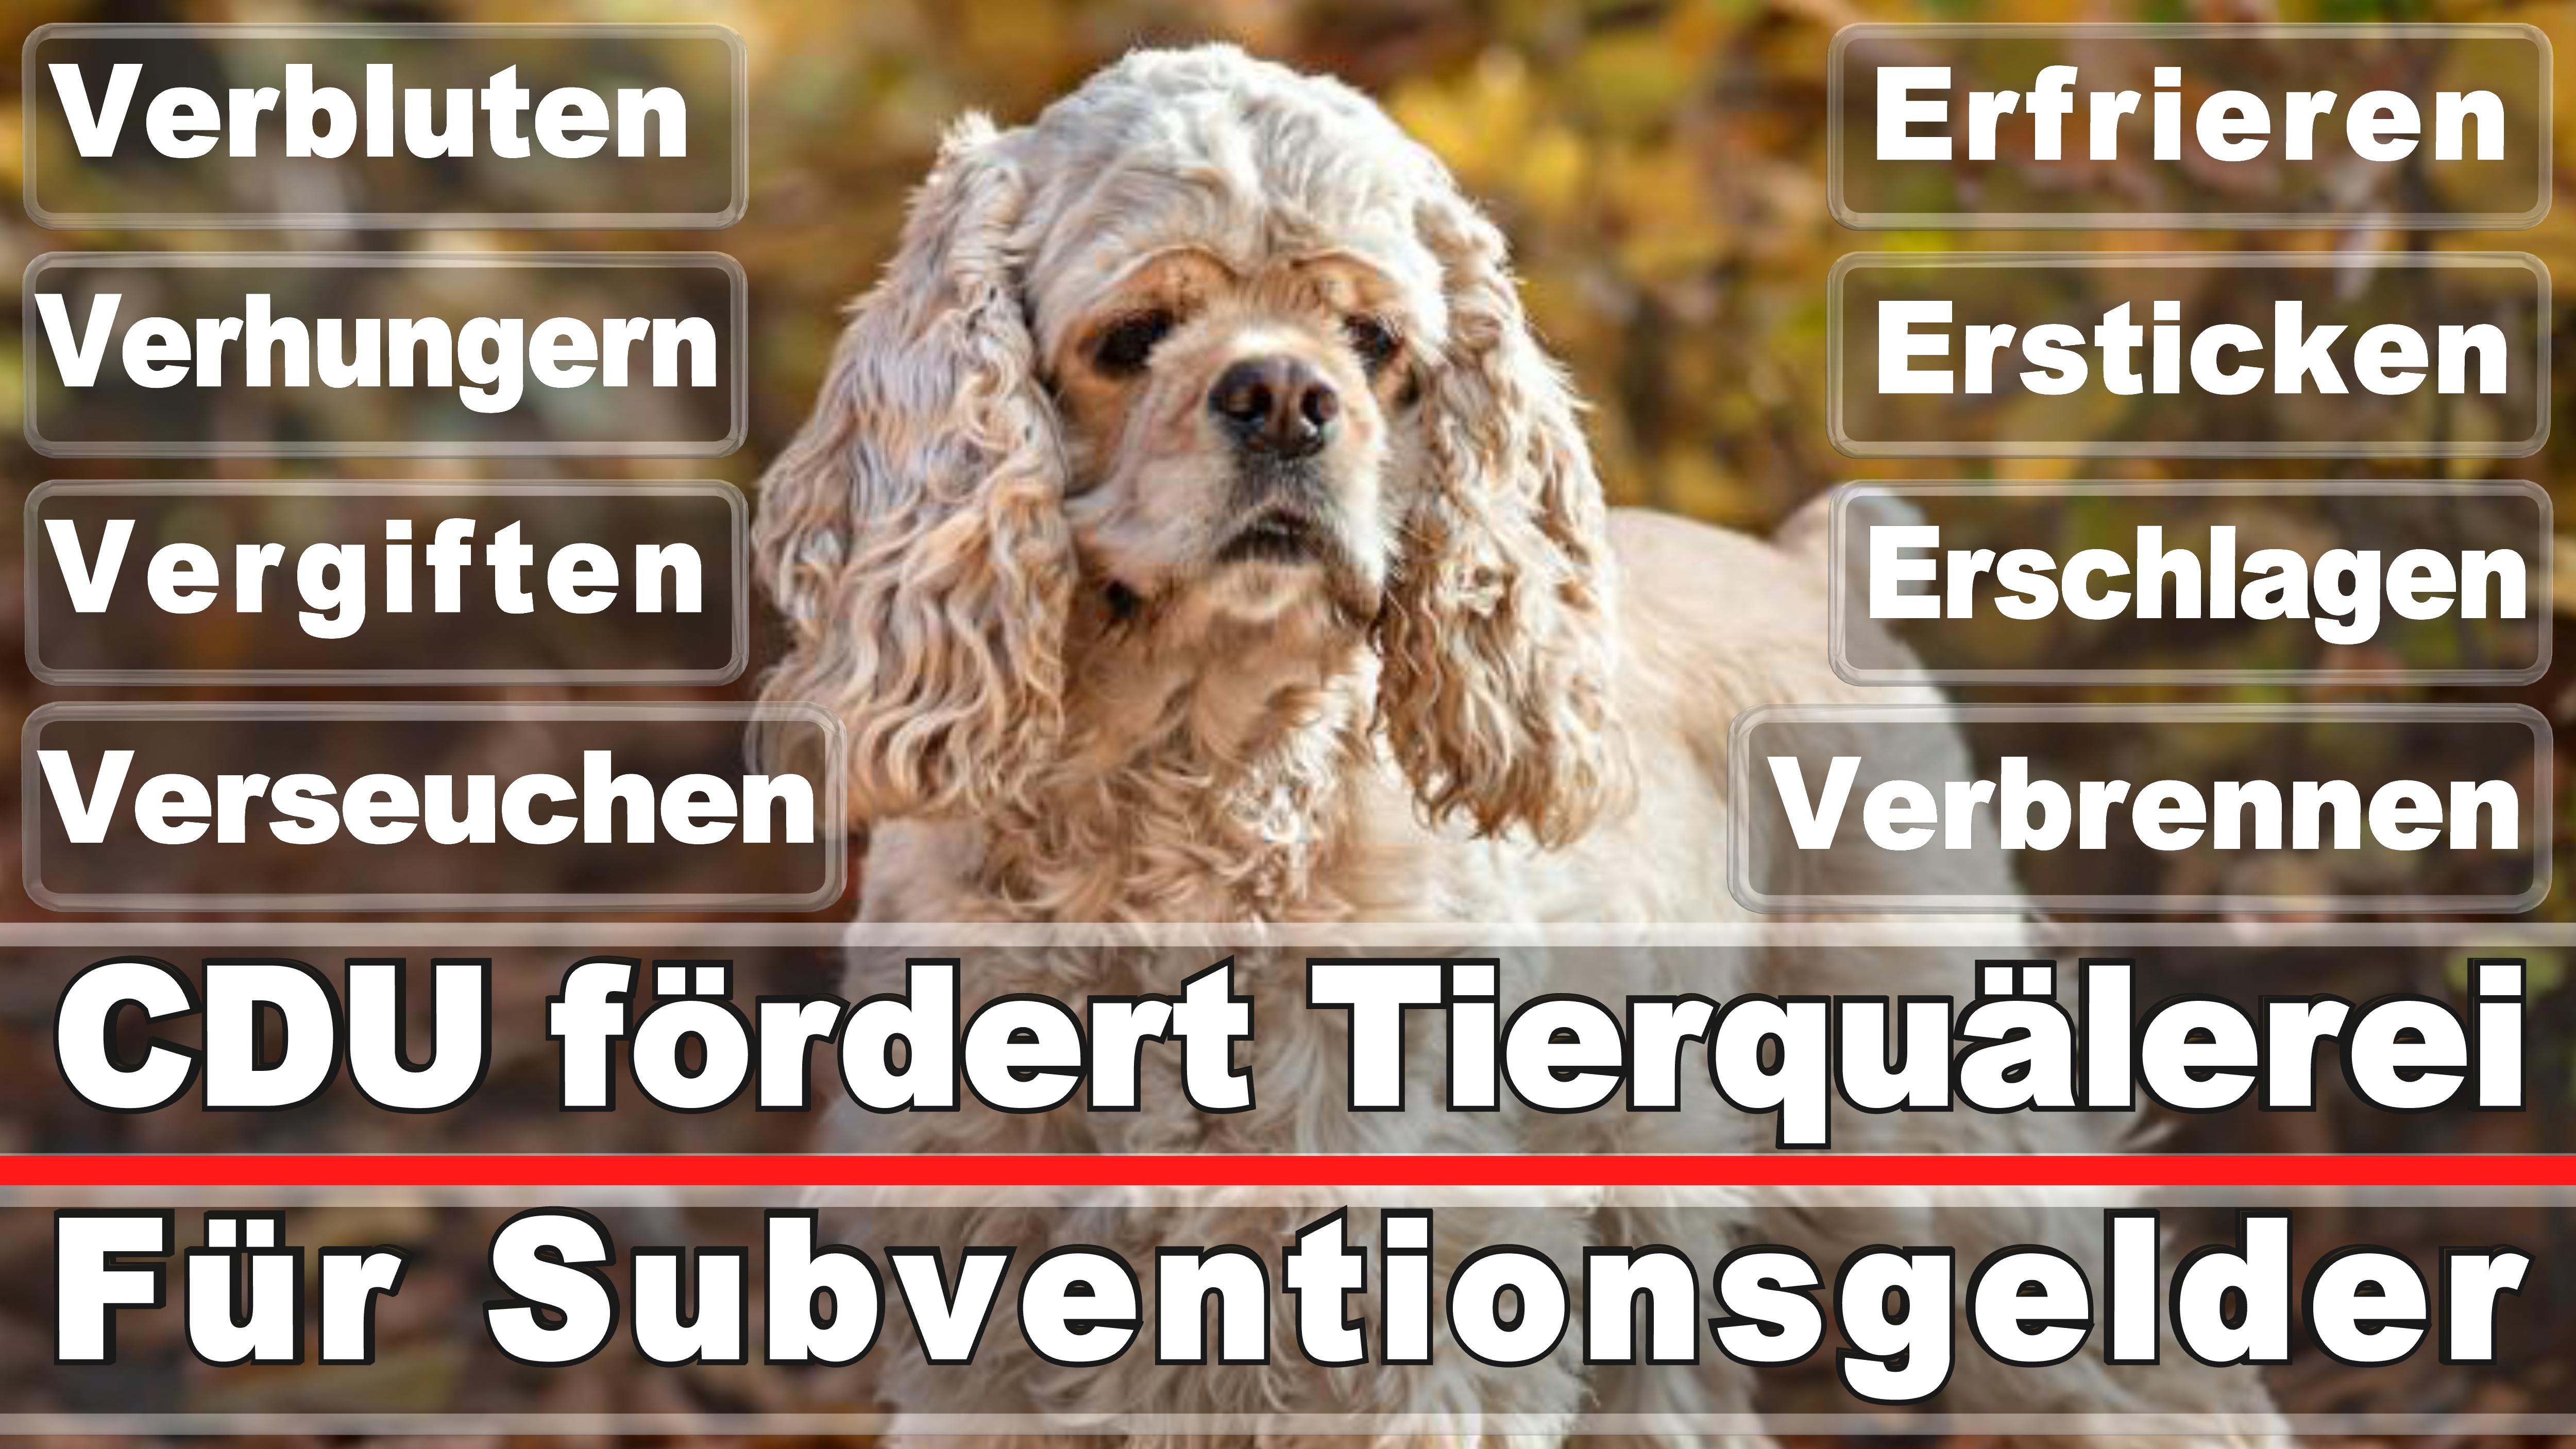 Landtagswahl-Bundestagswahl-CDU-SPD-FDP-AFD-Linke-Piraten-Tierschutzpartei (37)